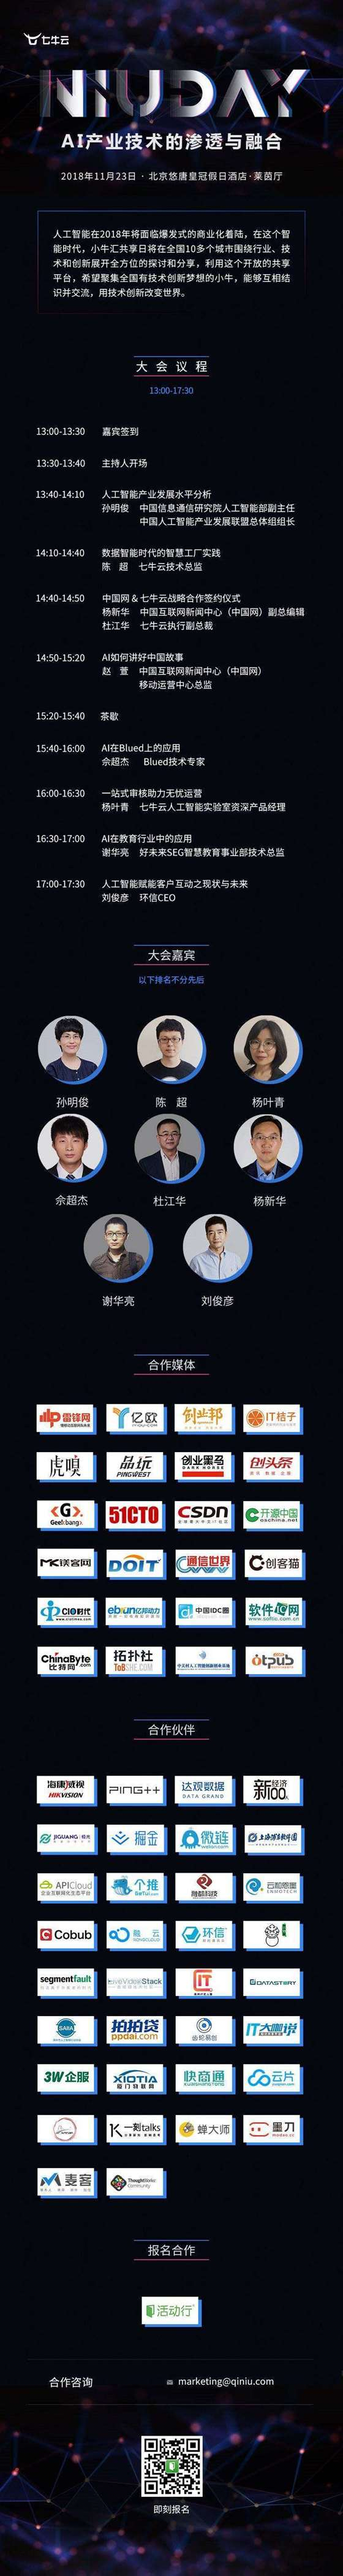 NIUDAY-长图(750)(11.22)北京.jpg